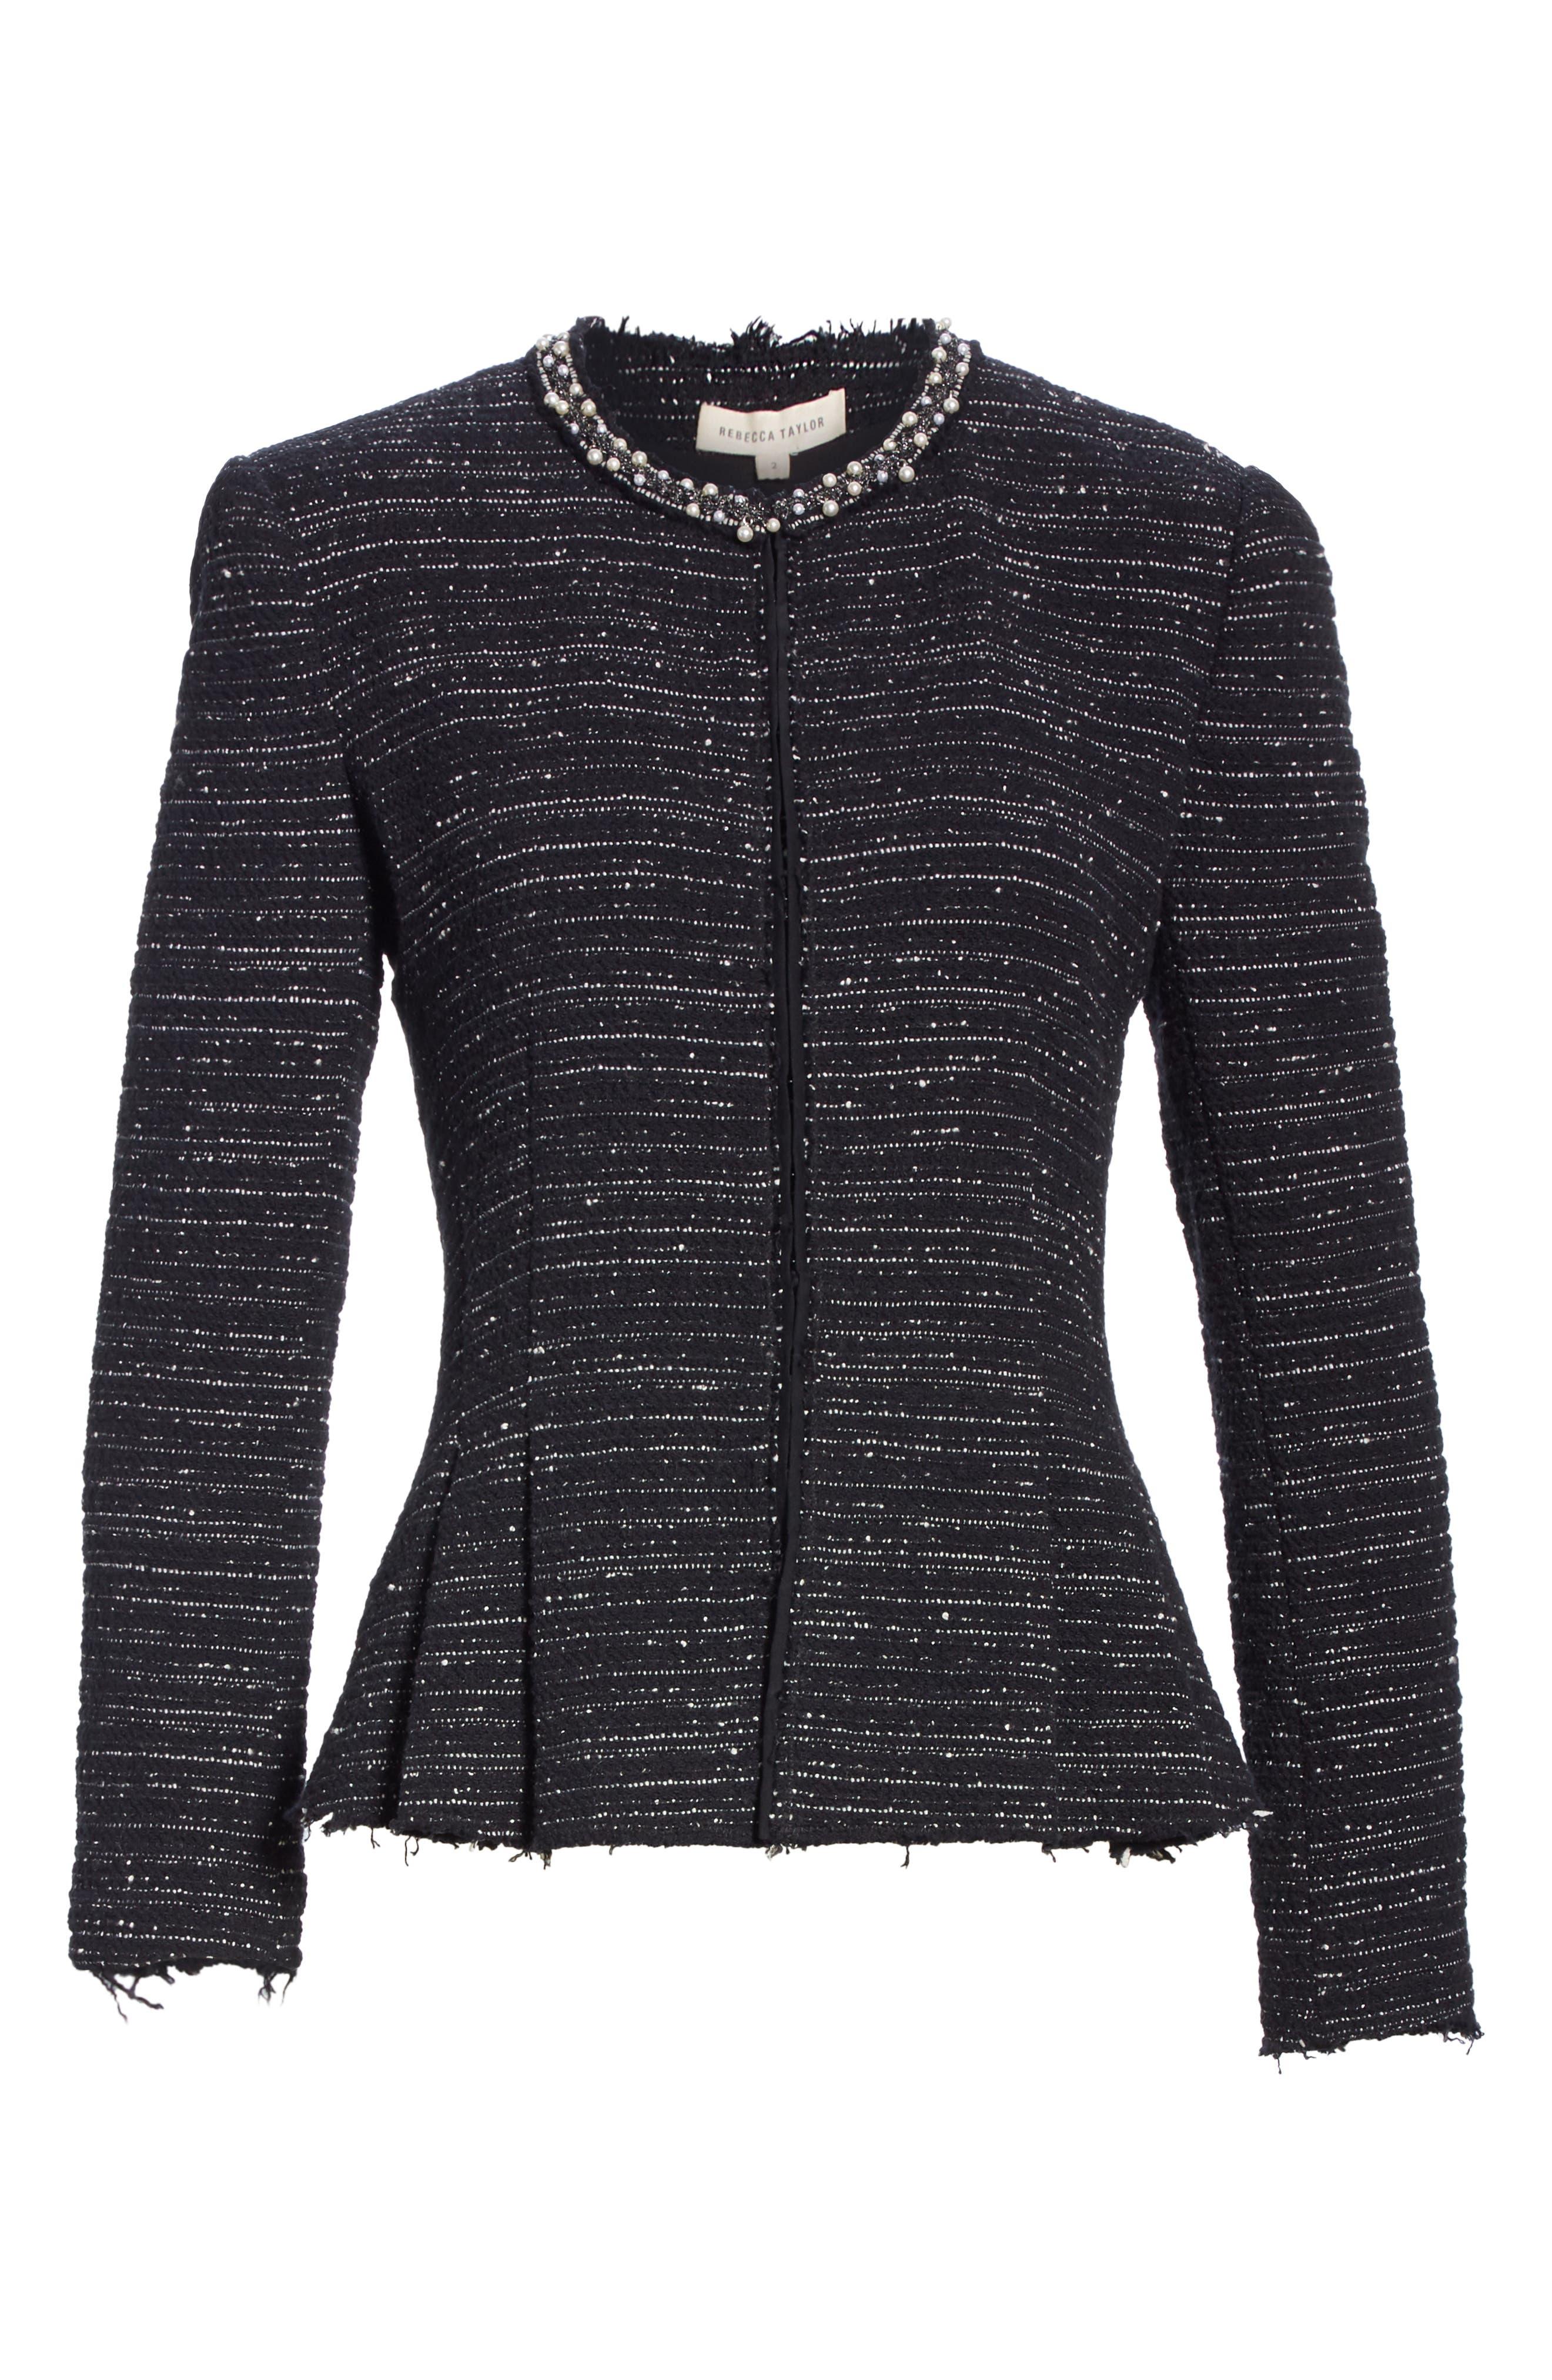 Embellished Stretch Tweed Jacket,                             Alternate thumbnail 6, color,                             BLACK COMBO